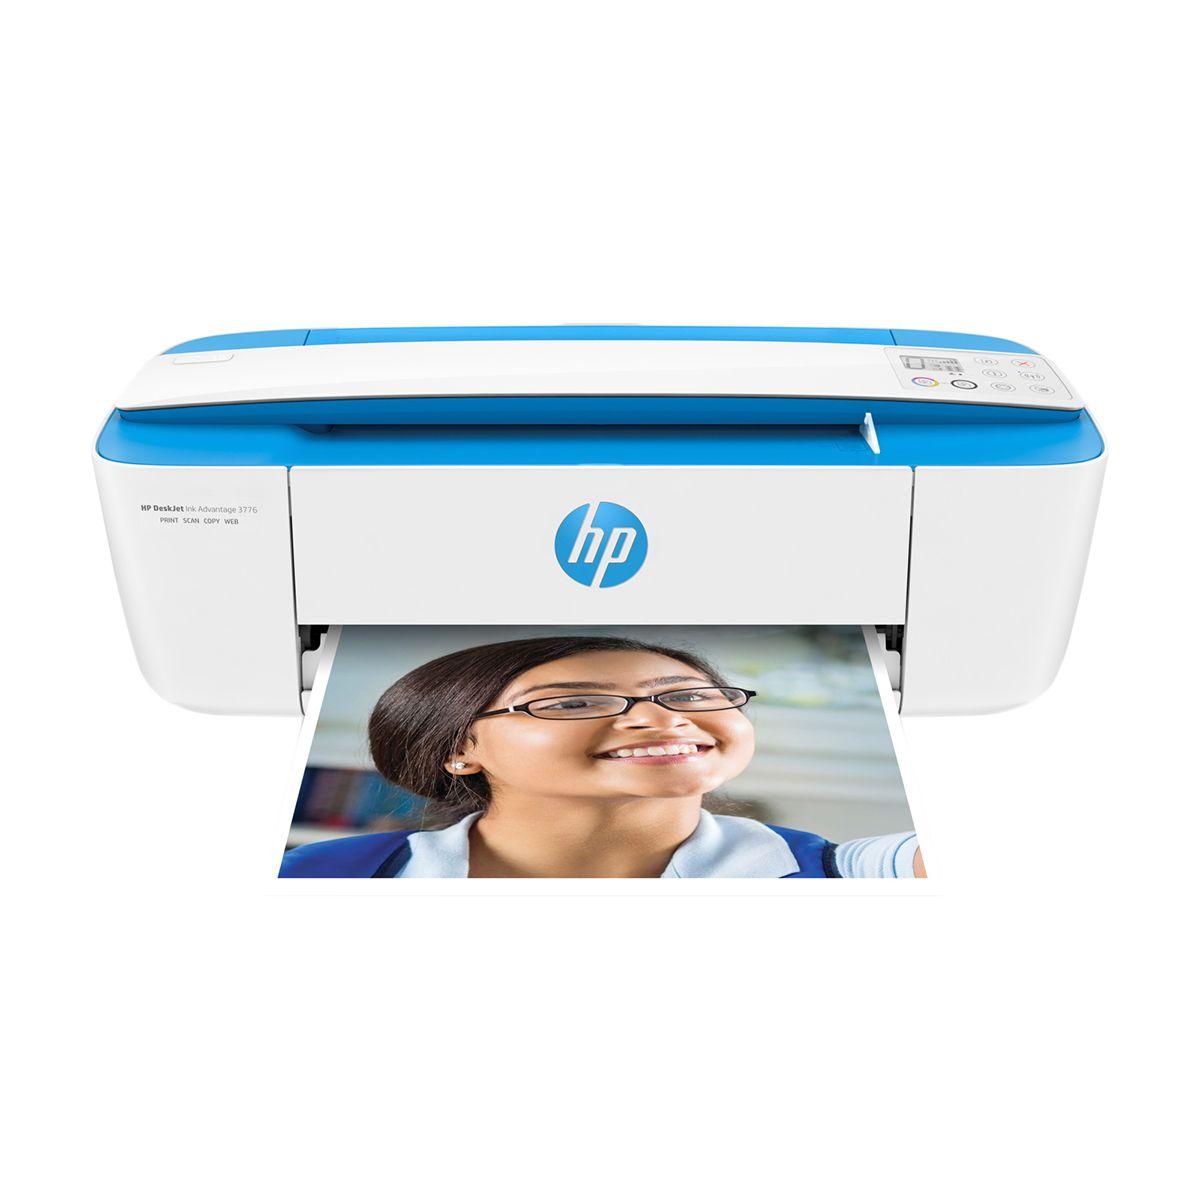 Impressora Multifuncional HP 3776/3775, Jato de Tinta, USB 2.0, Wifi, Copiadora, Scanner, Digitalizadora